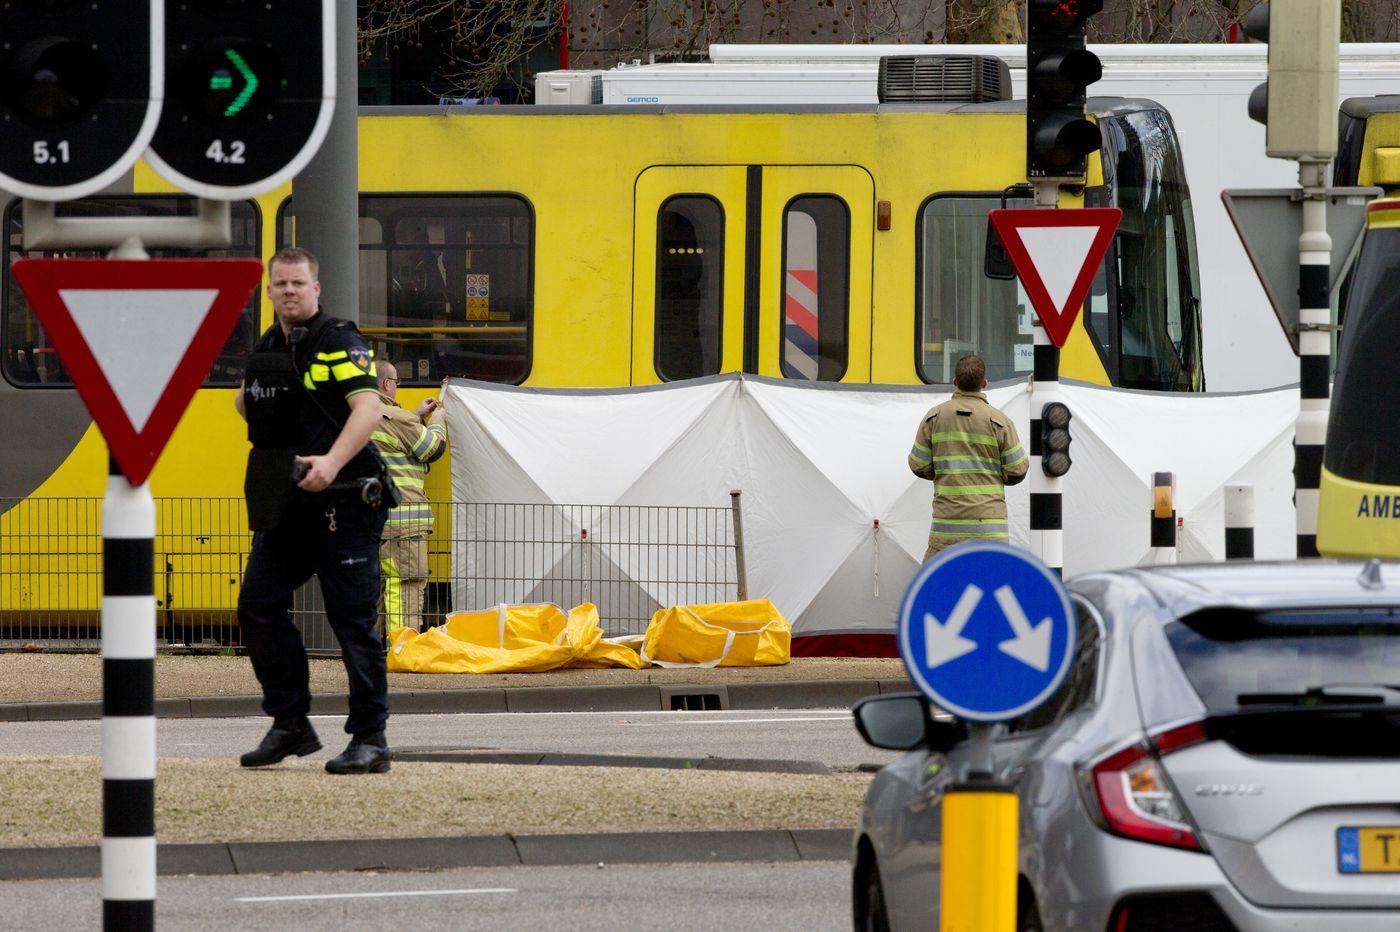 Gunman kills 3 on Dutch tram; mayor says terror likely